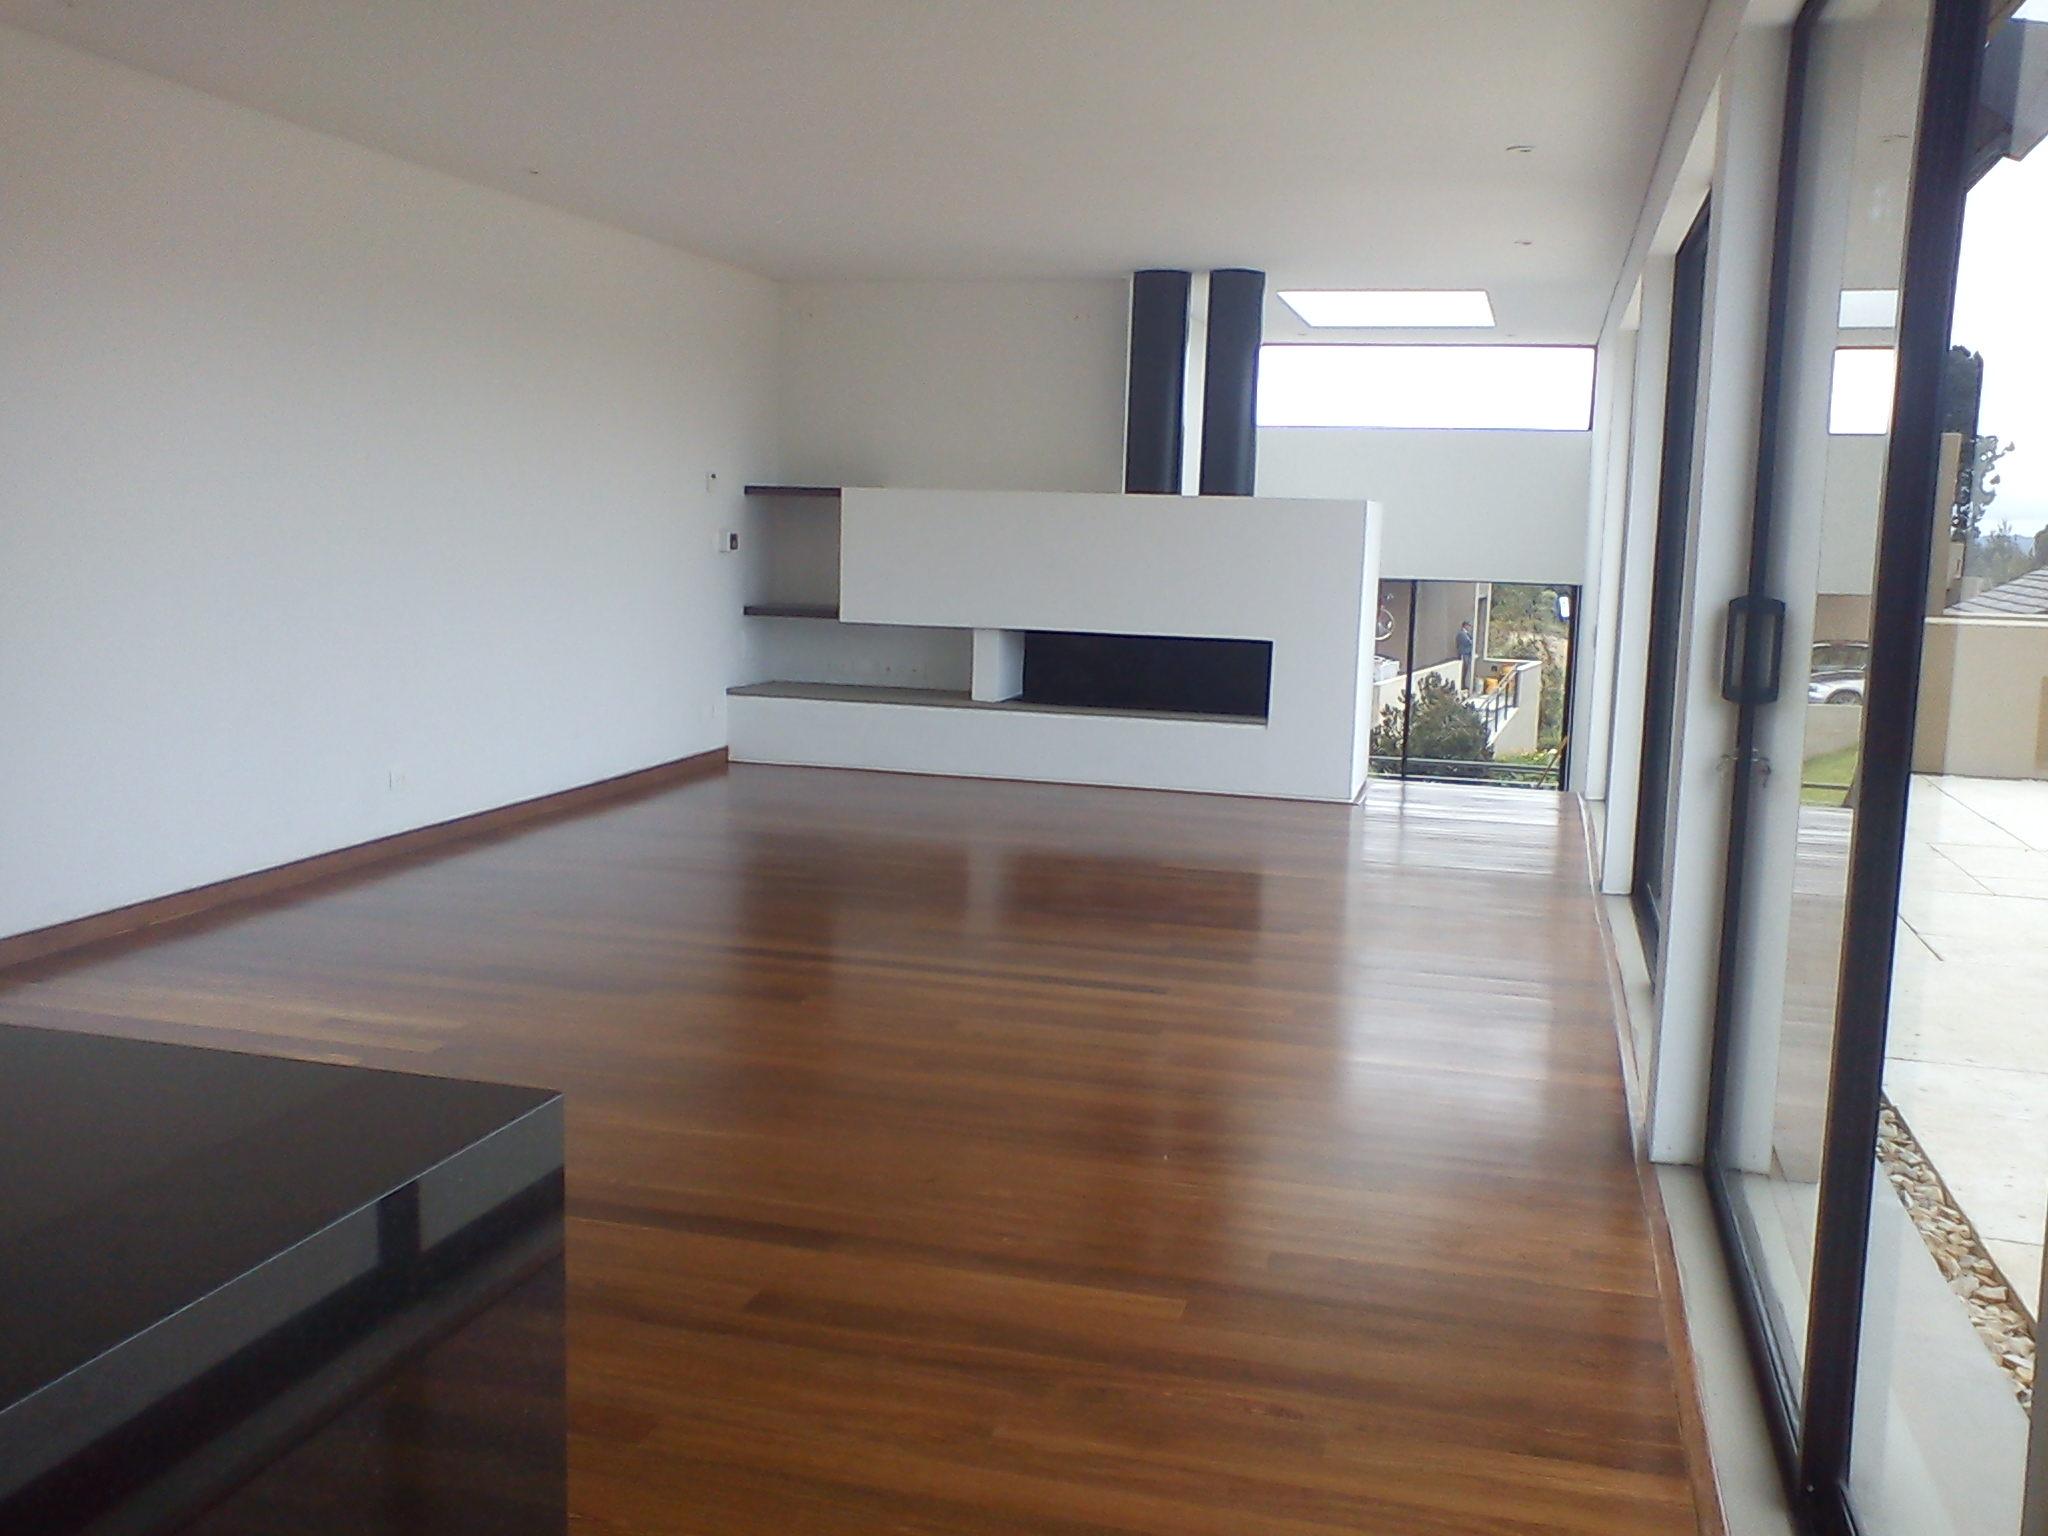 Piso macizo tradicional pisos teka - Rellenar juntas piso madera ...